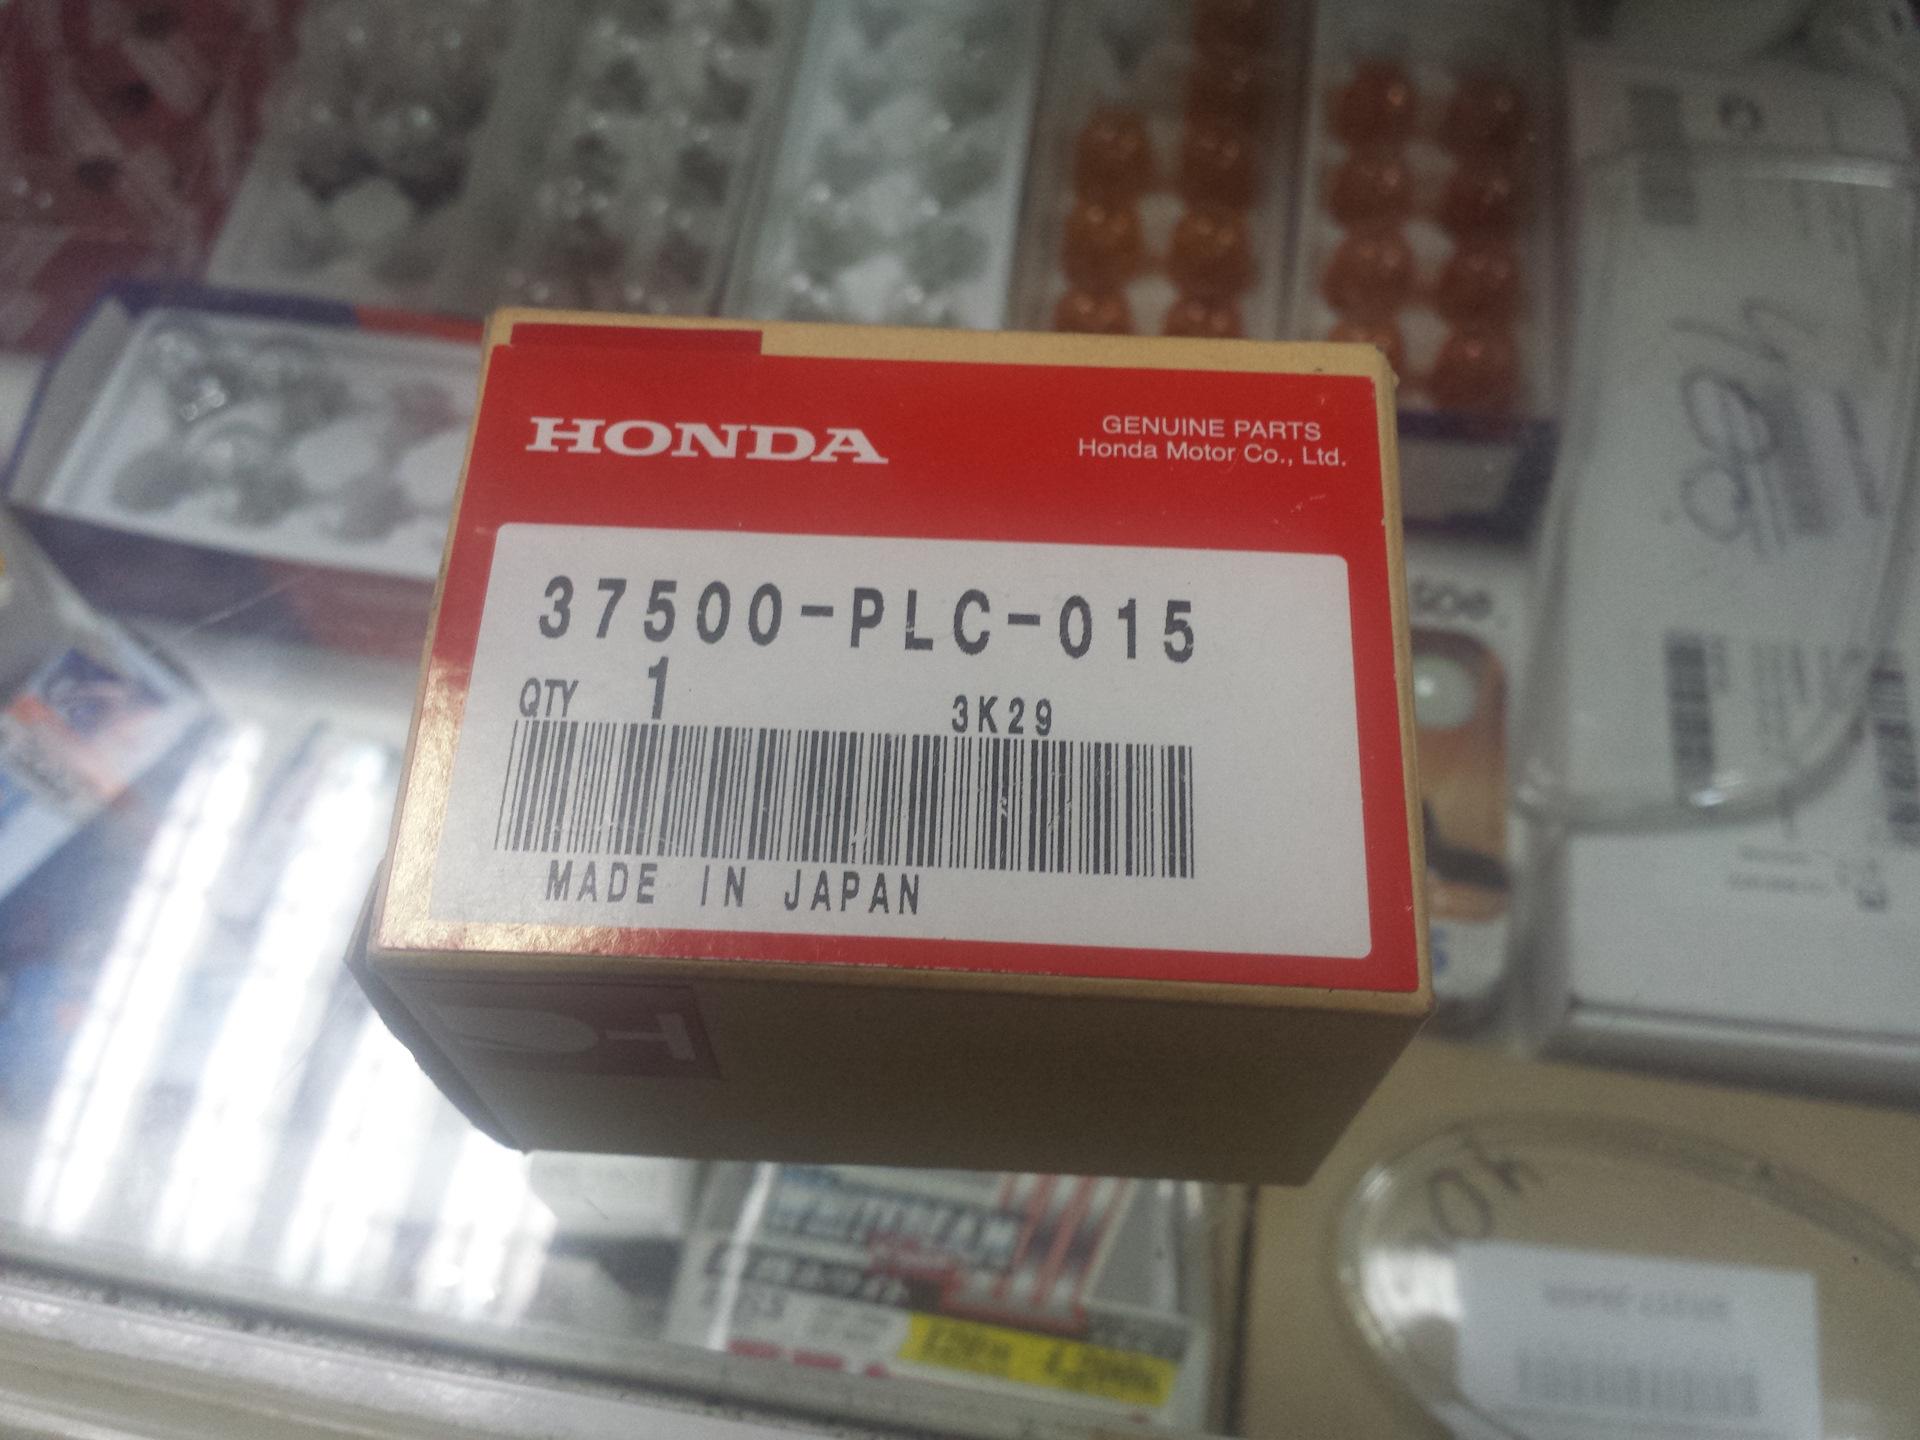 Решено]P0336 Crankshaft Position Sensor A Circuit Range/Perfomance